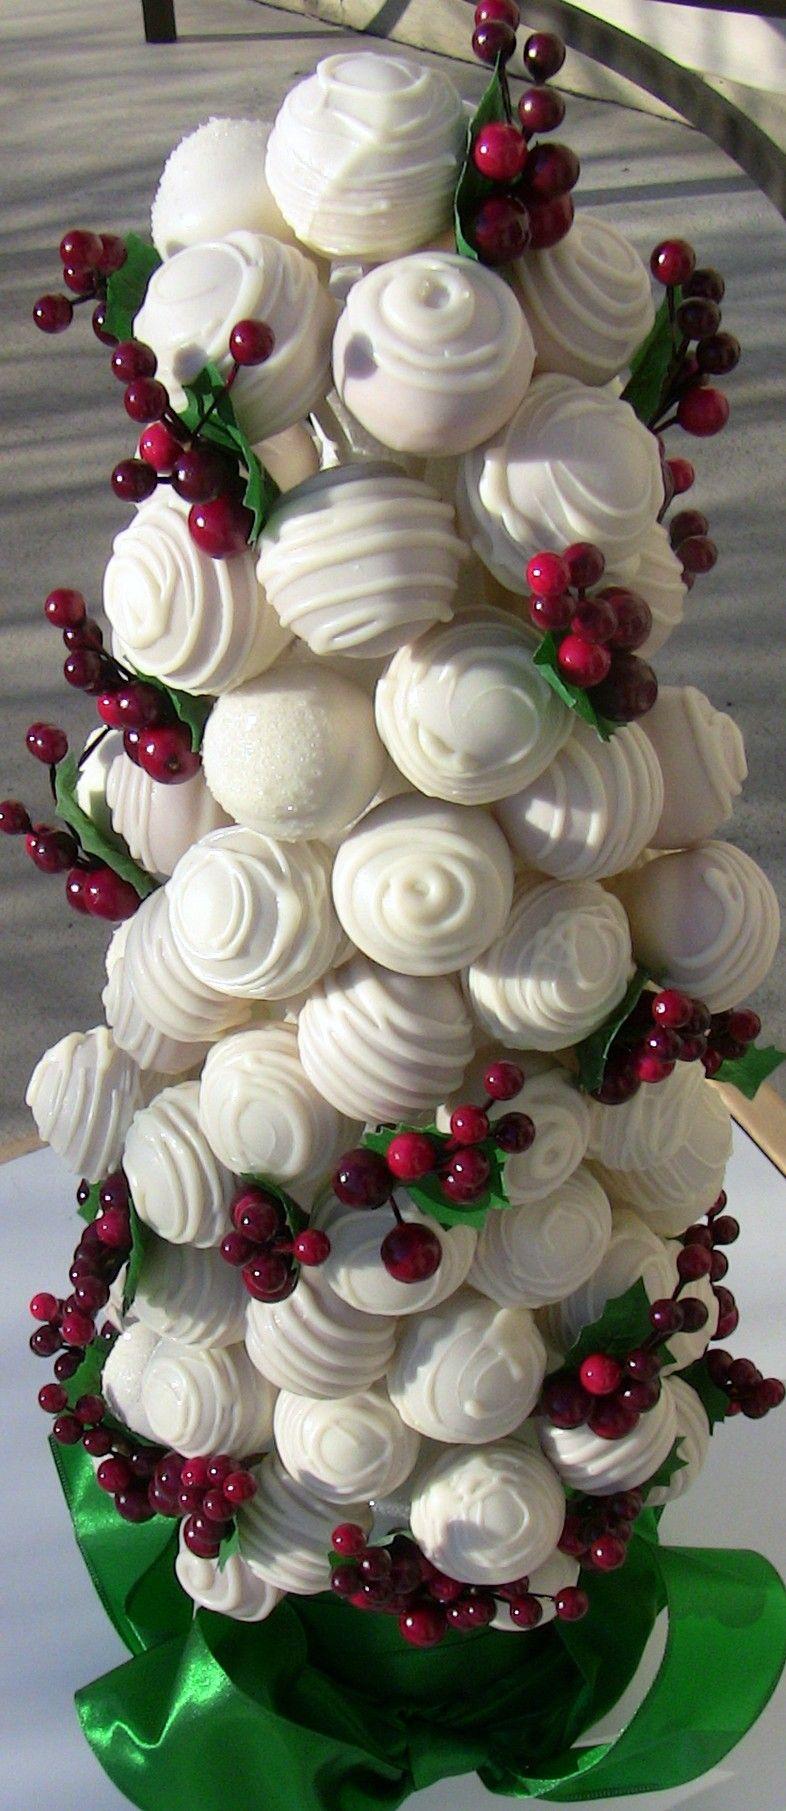 cake pop ideas wedding shower%0A Christmas cake pop tree   love this